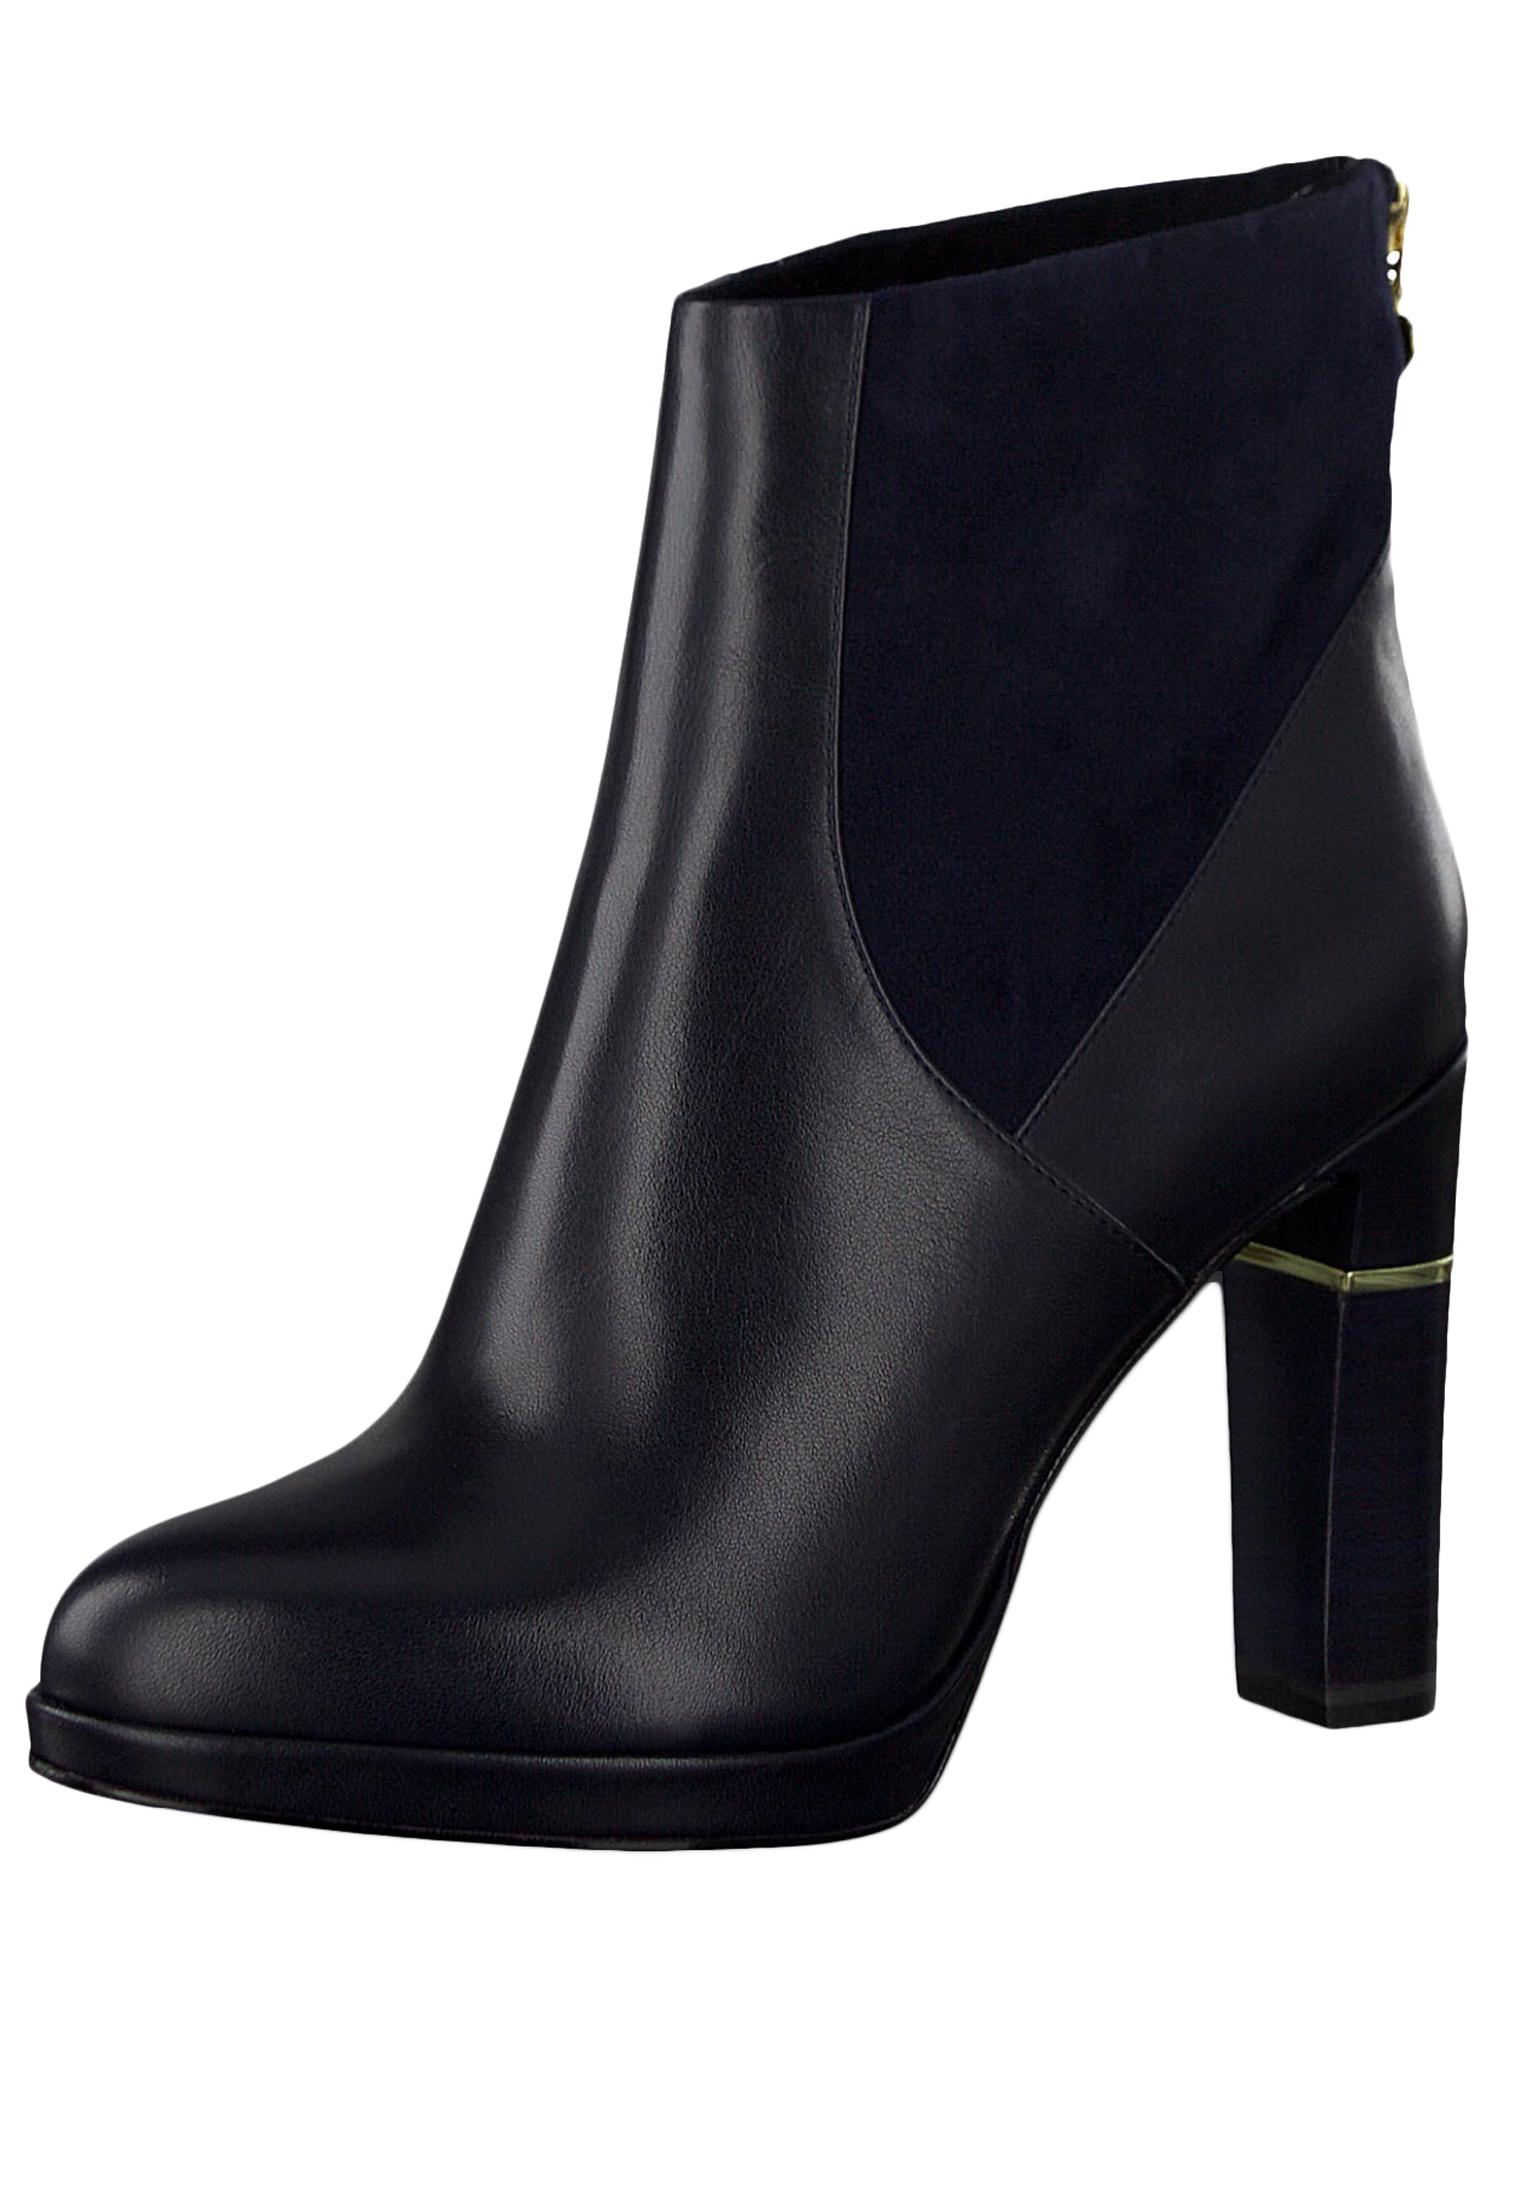 Tamaris 1 25303 23 805 Damen Stiefelette High Heeled Ankle Boot Leder Navy Dunkelblau